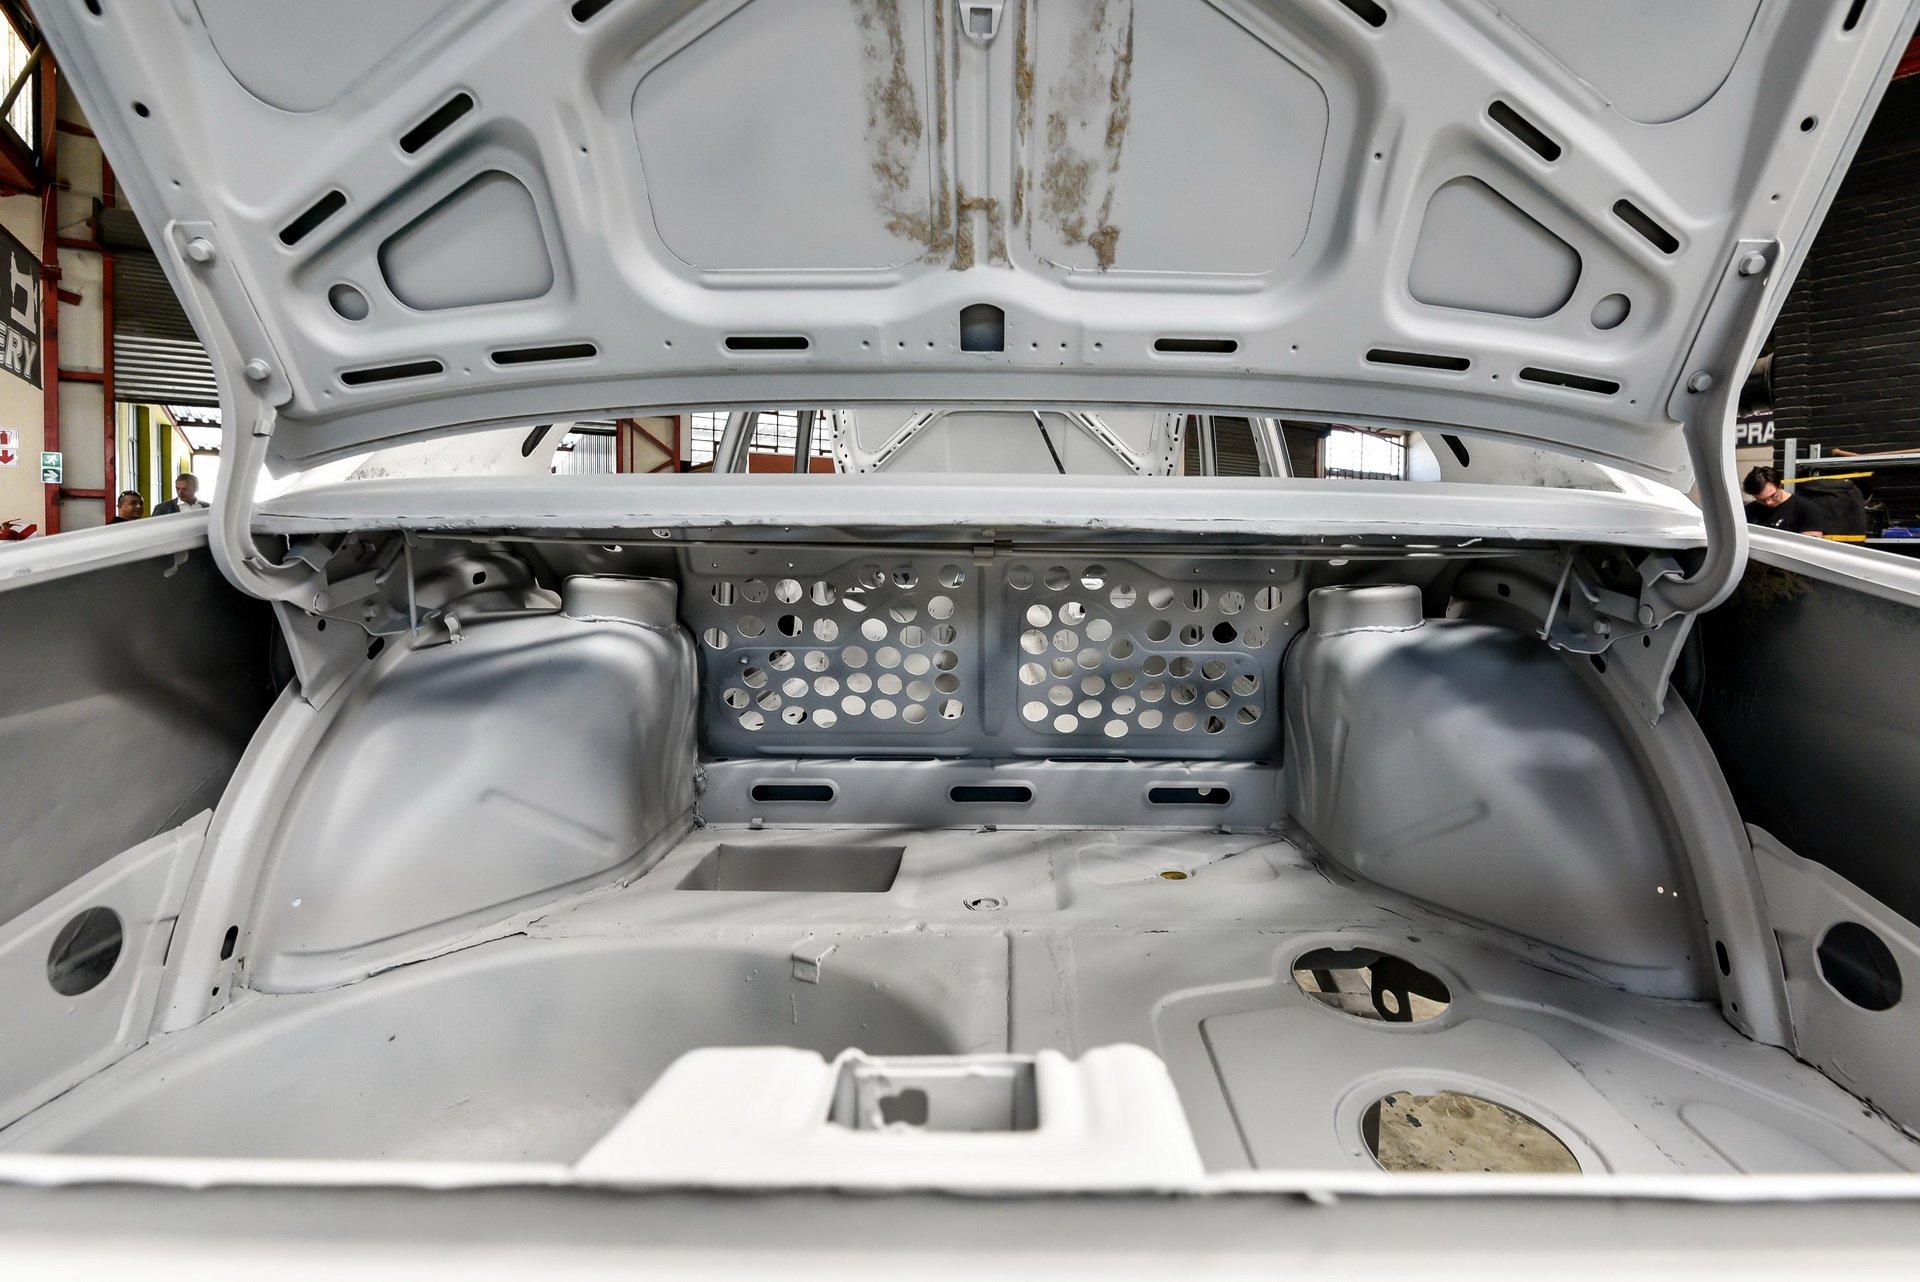 BMW-530-MLE-Restoration-process-21